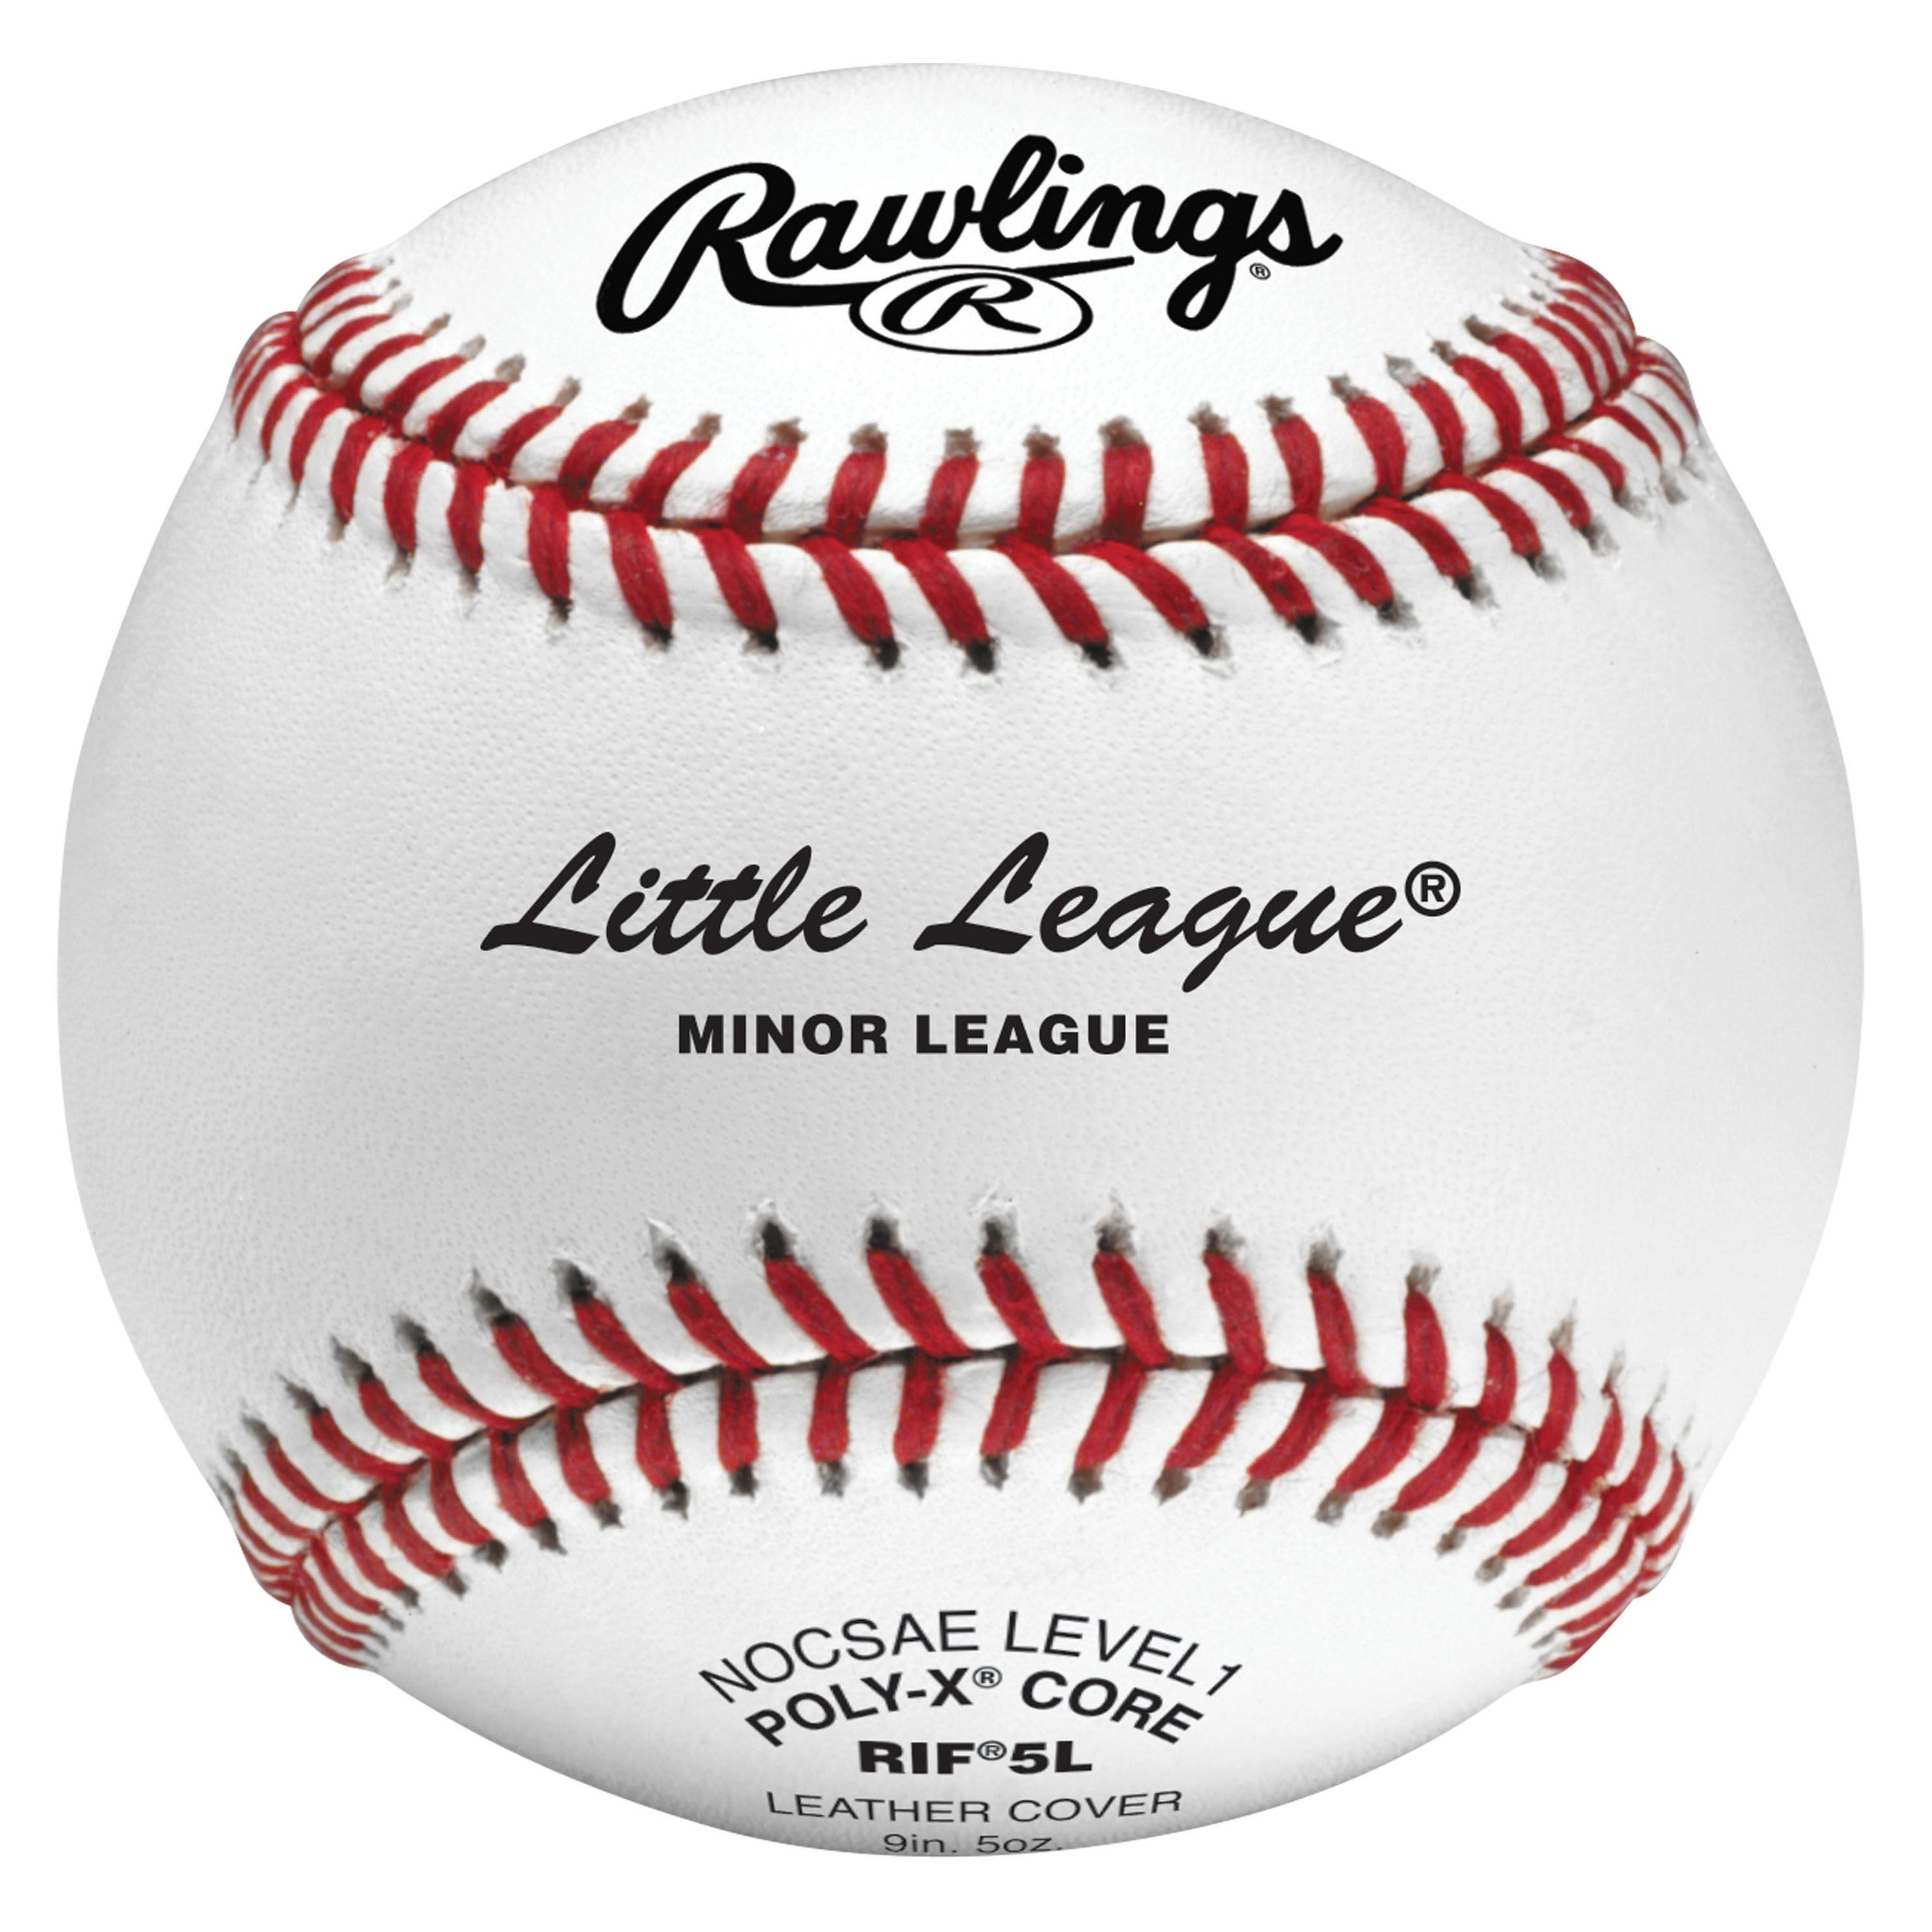 b02b7a403f0 Shop Rawlings RIF5 Level 1 Little League Baseball (Dozen) White - Free  Shipping Today - Overstock - 17741177